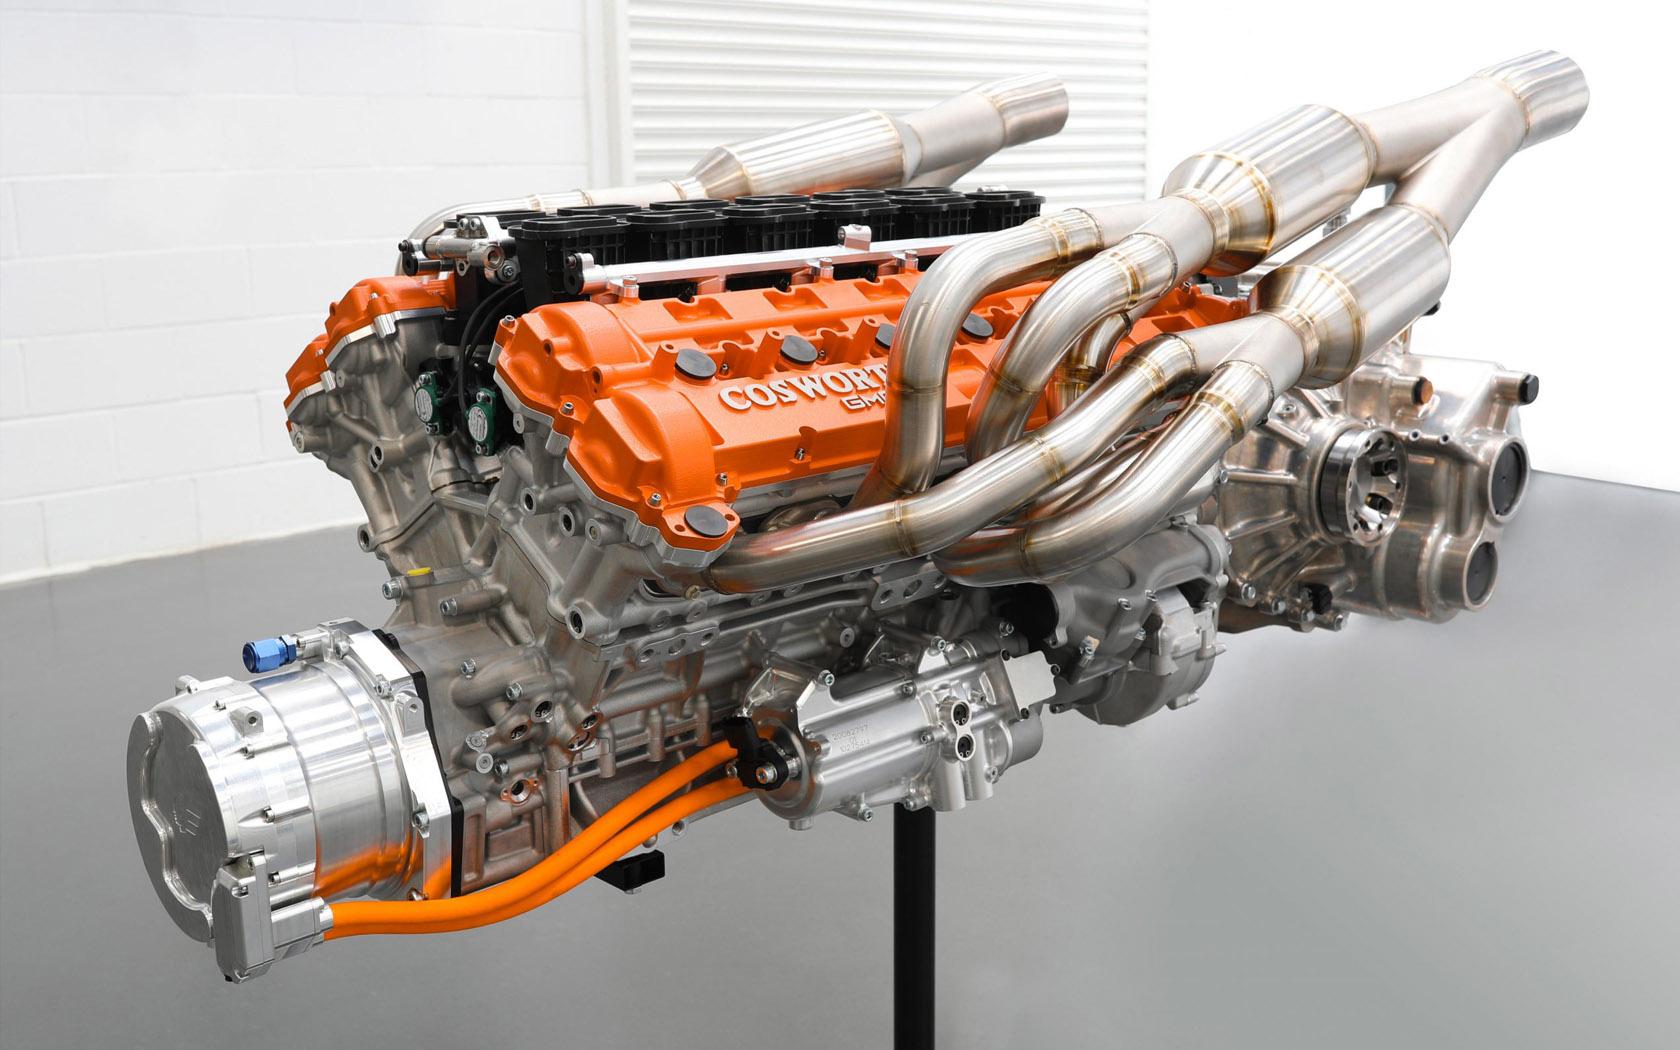 GMA Cosworth V12 Engine top 50 car engines